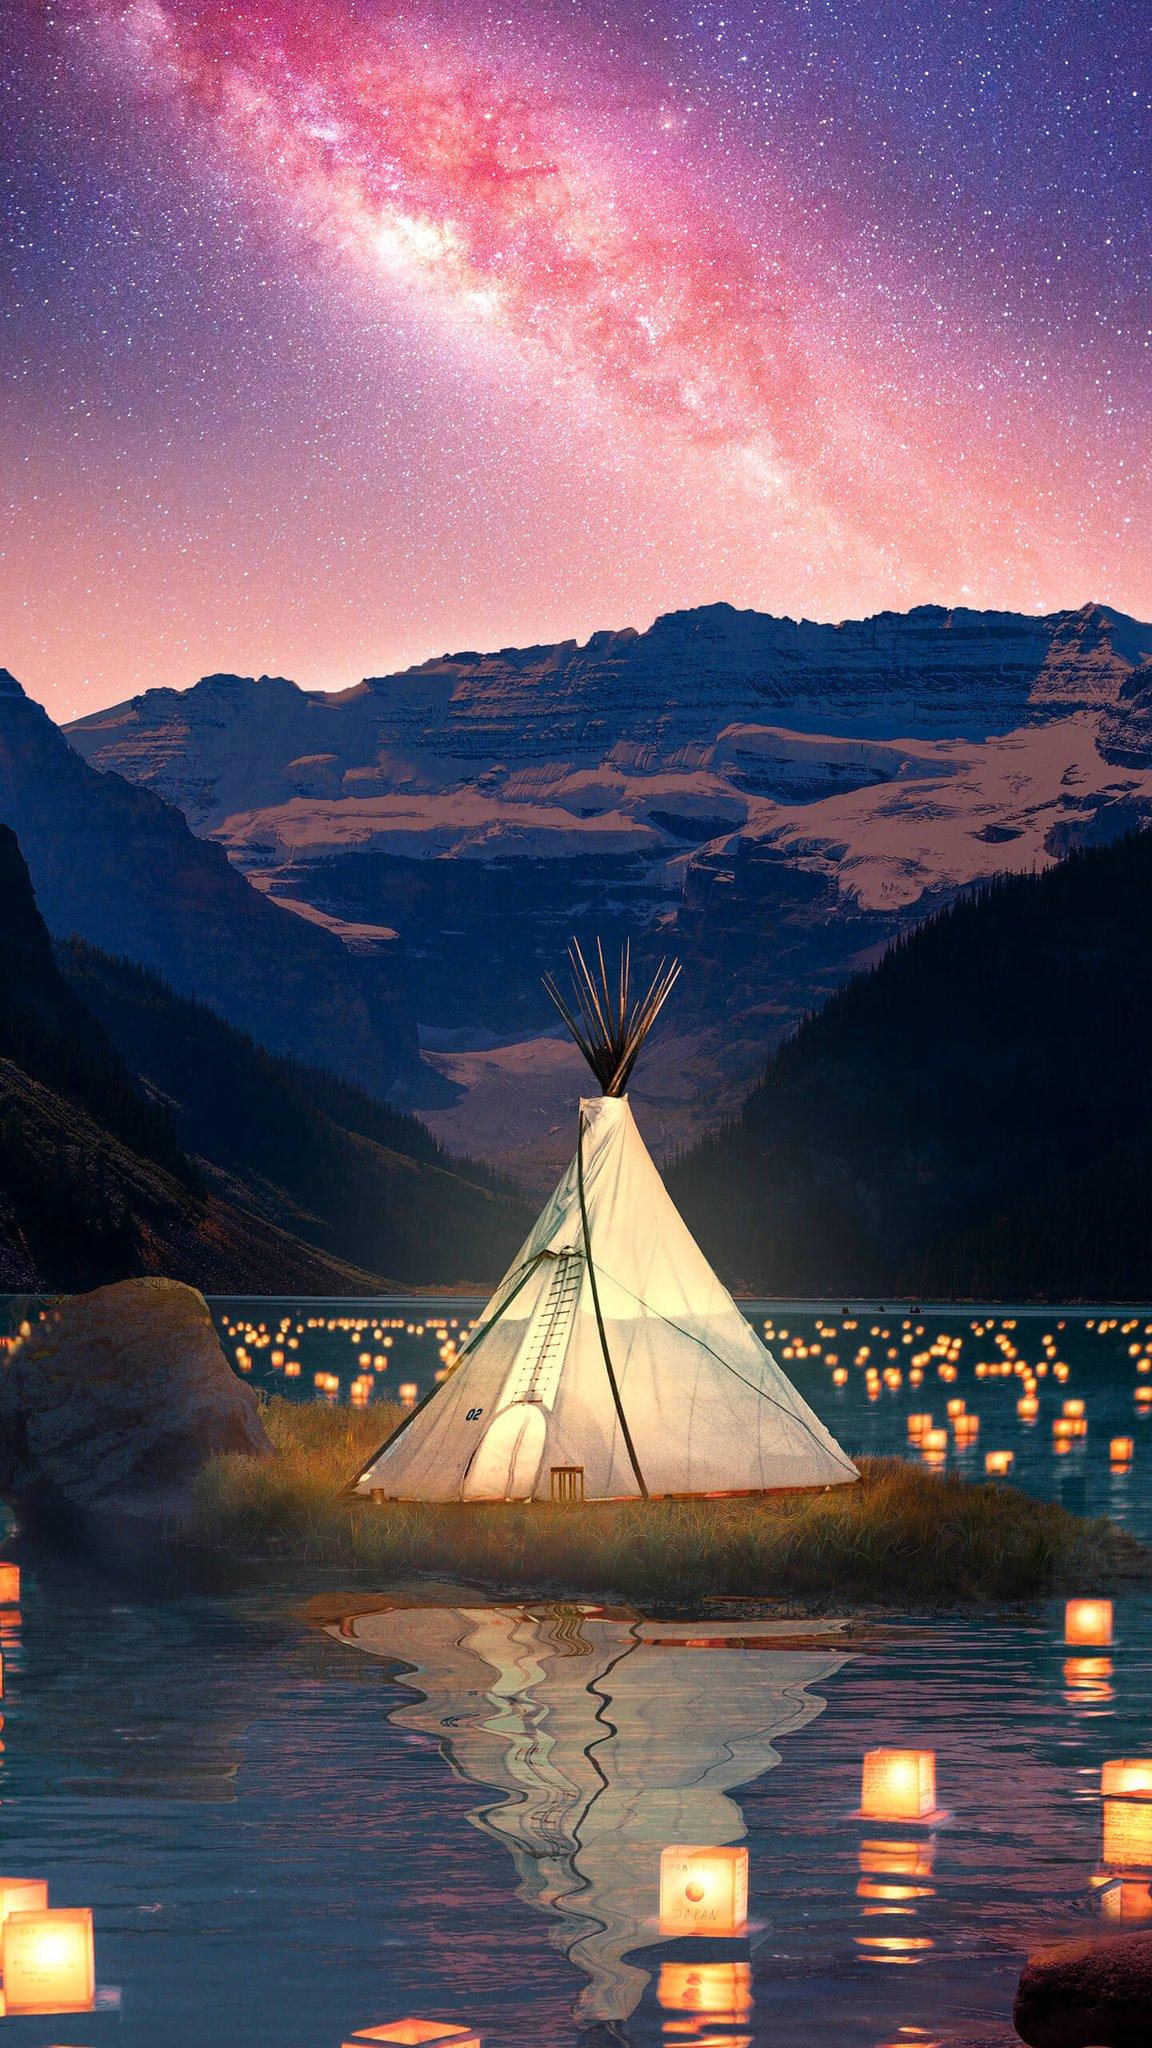 Wallpaper Tent Mountains Stars Vertical Portrait Display 1152x2048 Devilson 1691689 Hd Wallpapers Wallhere